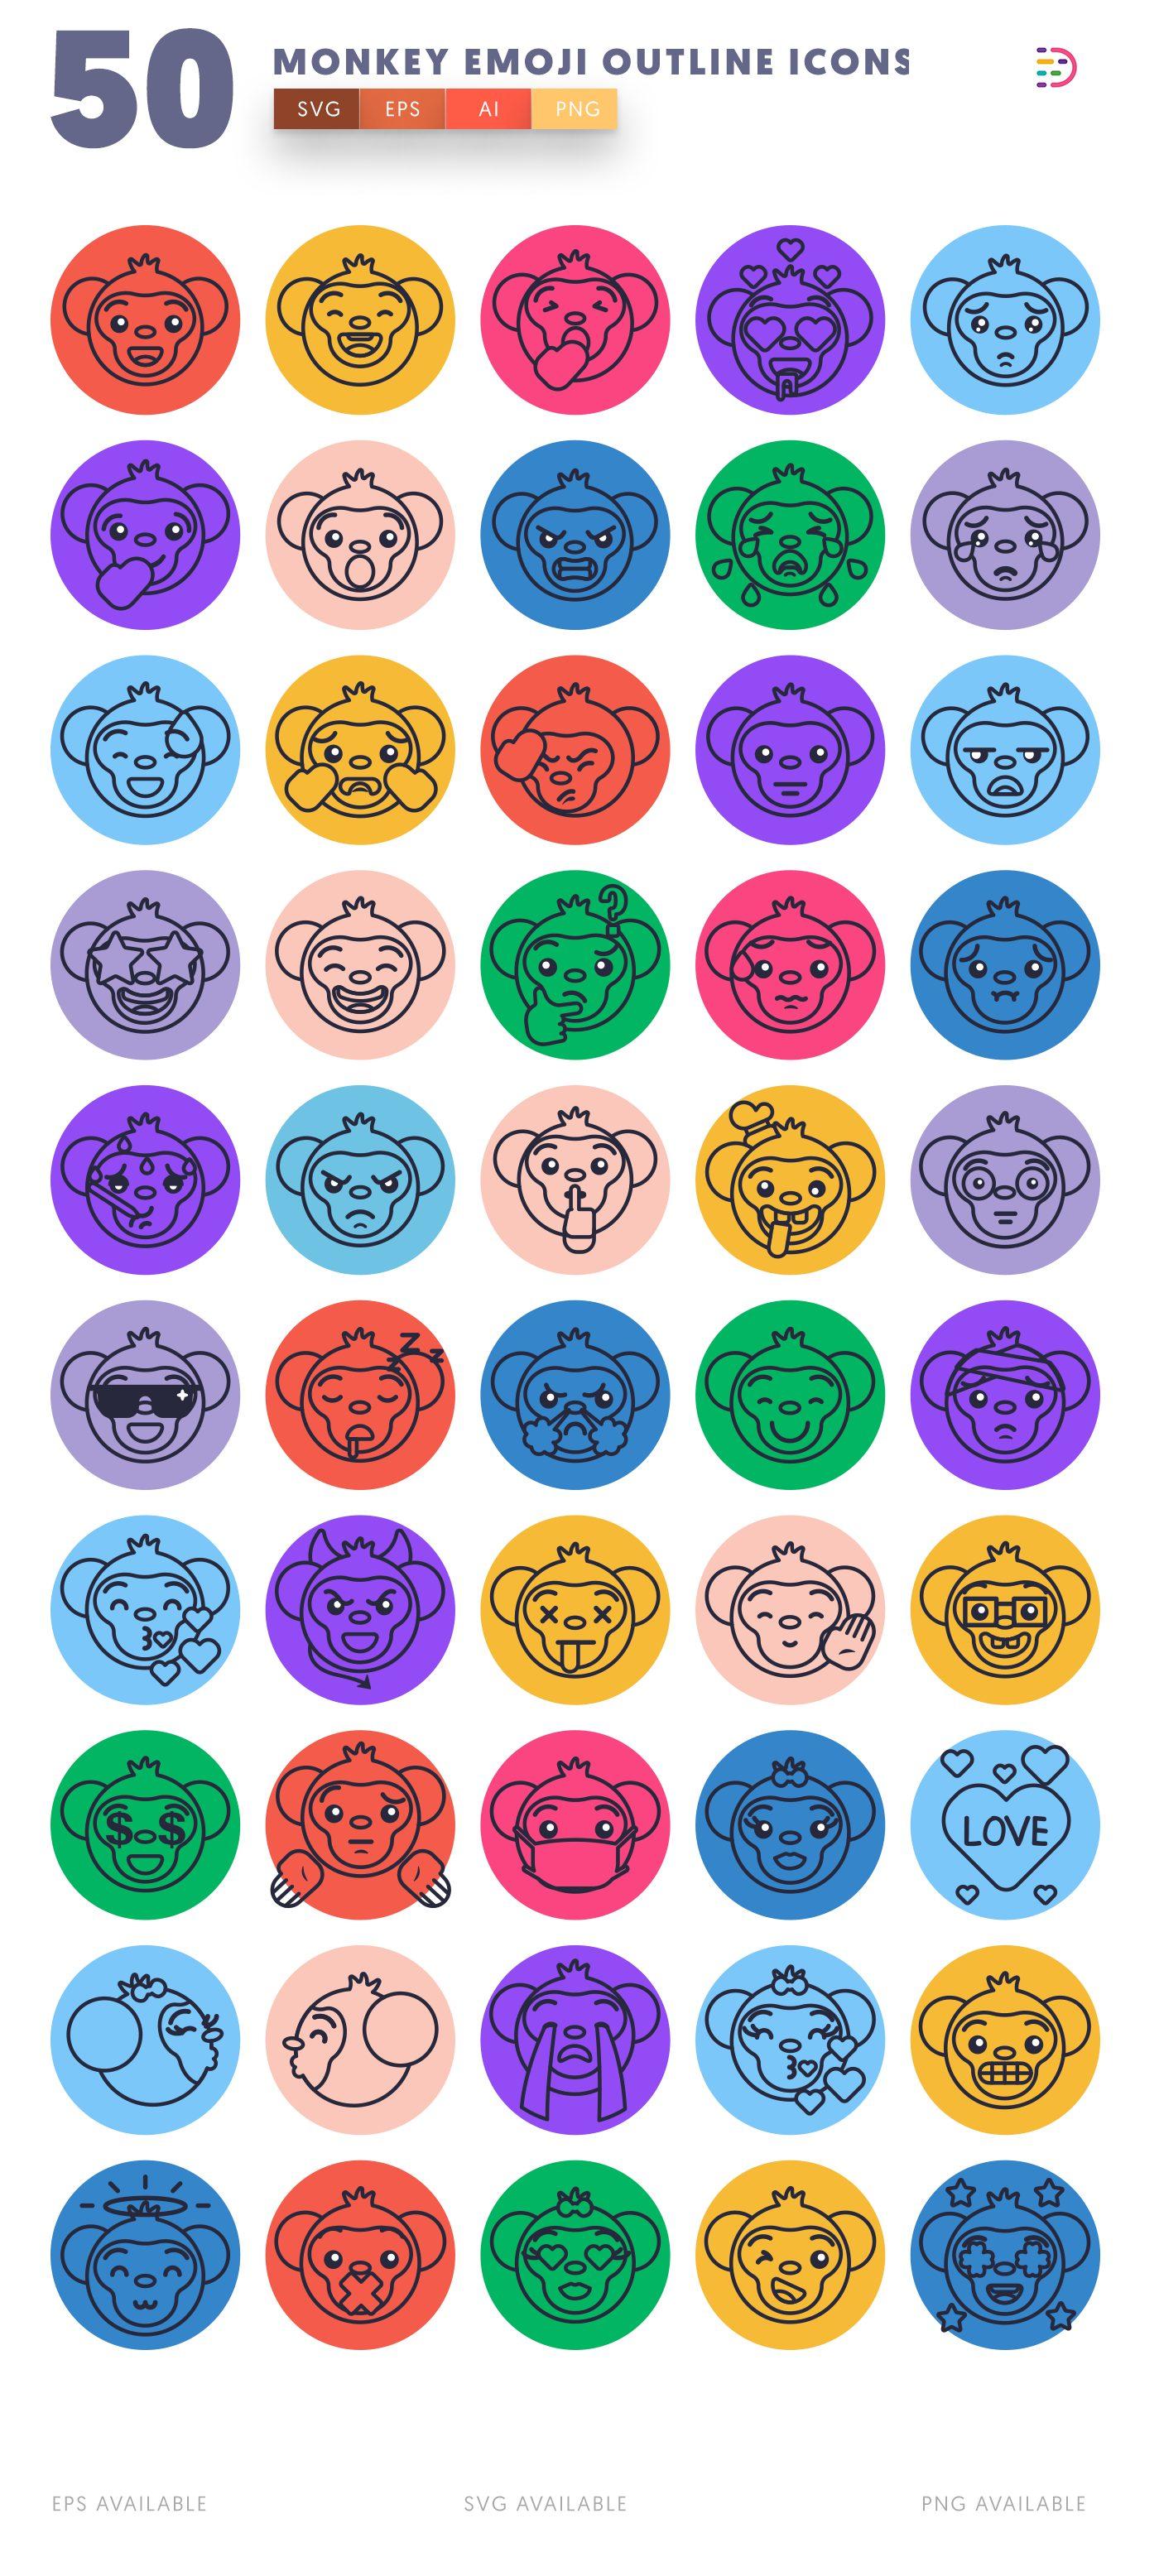 Monkey Emoji Outline icon pack